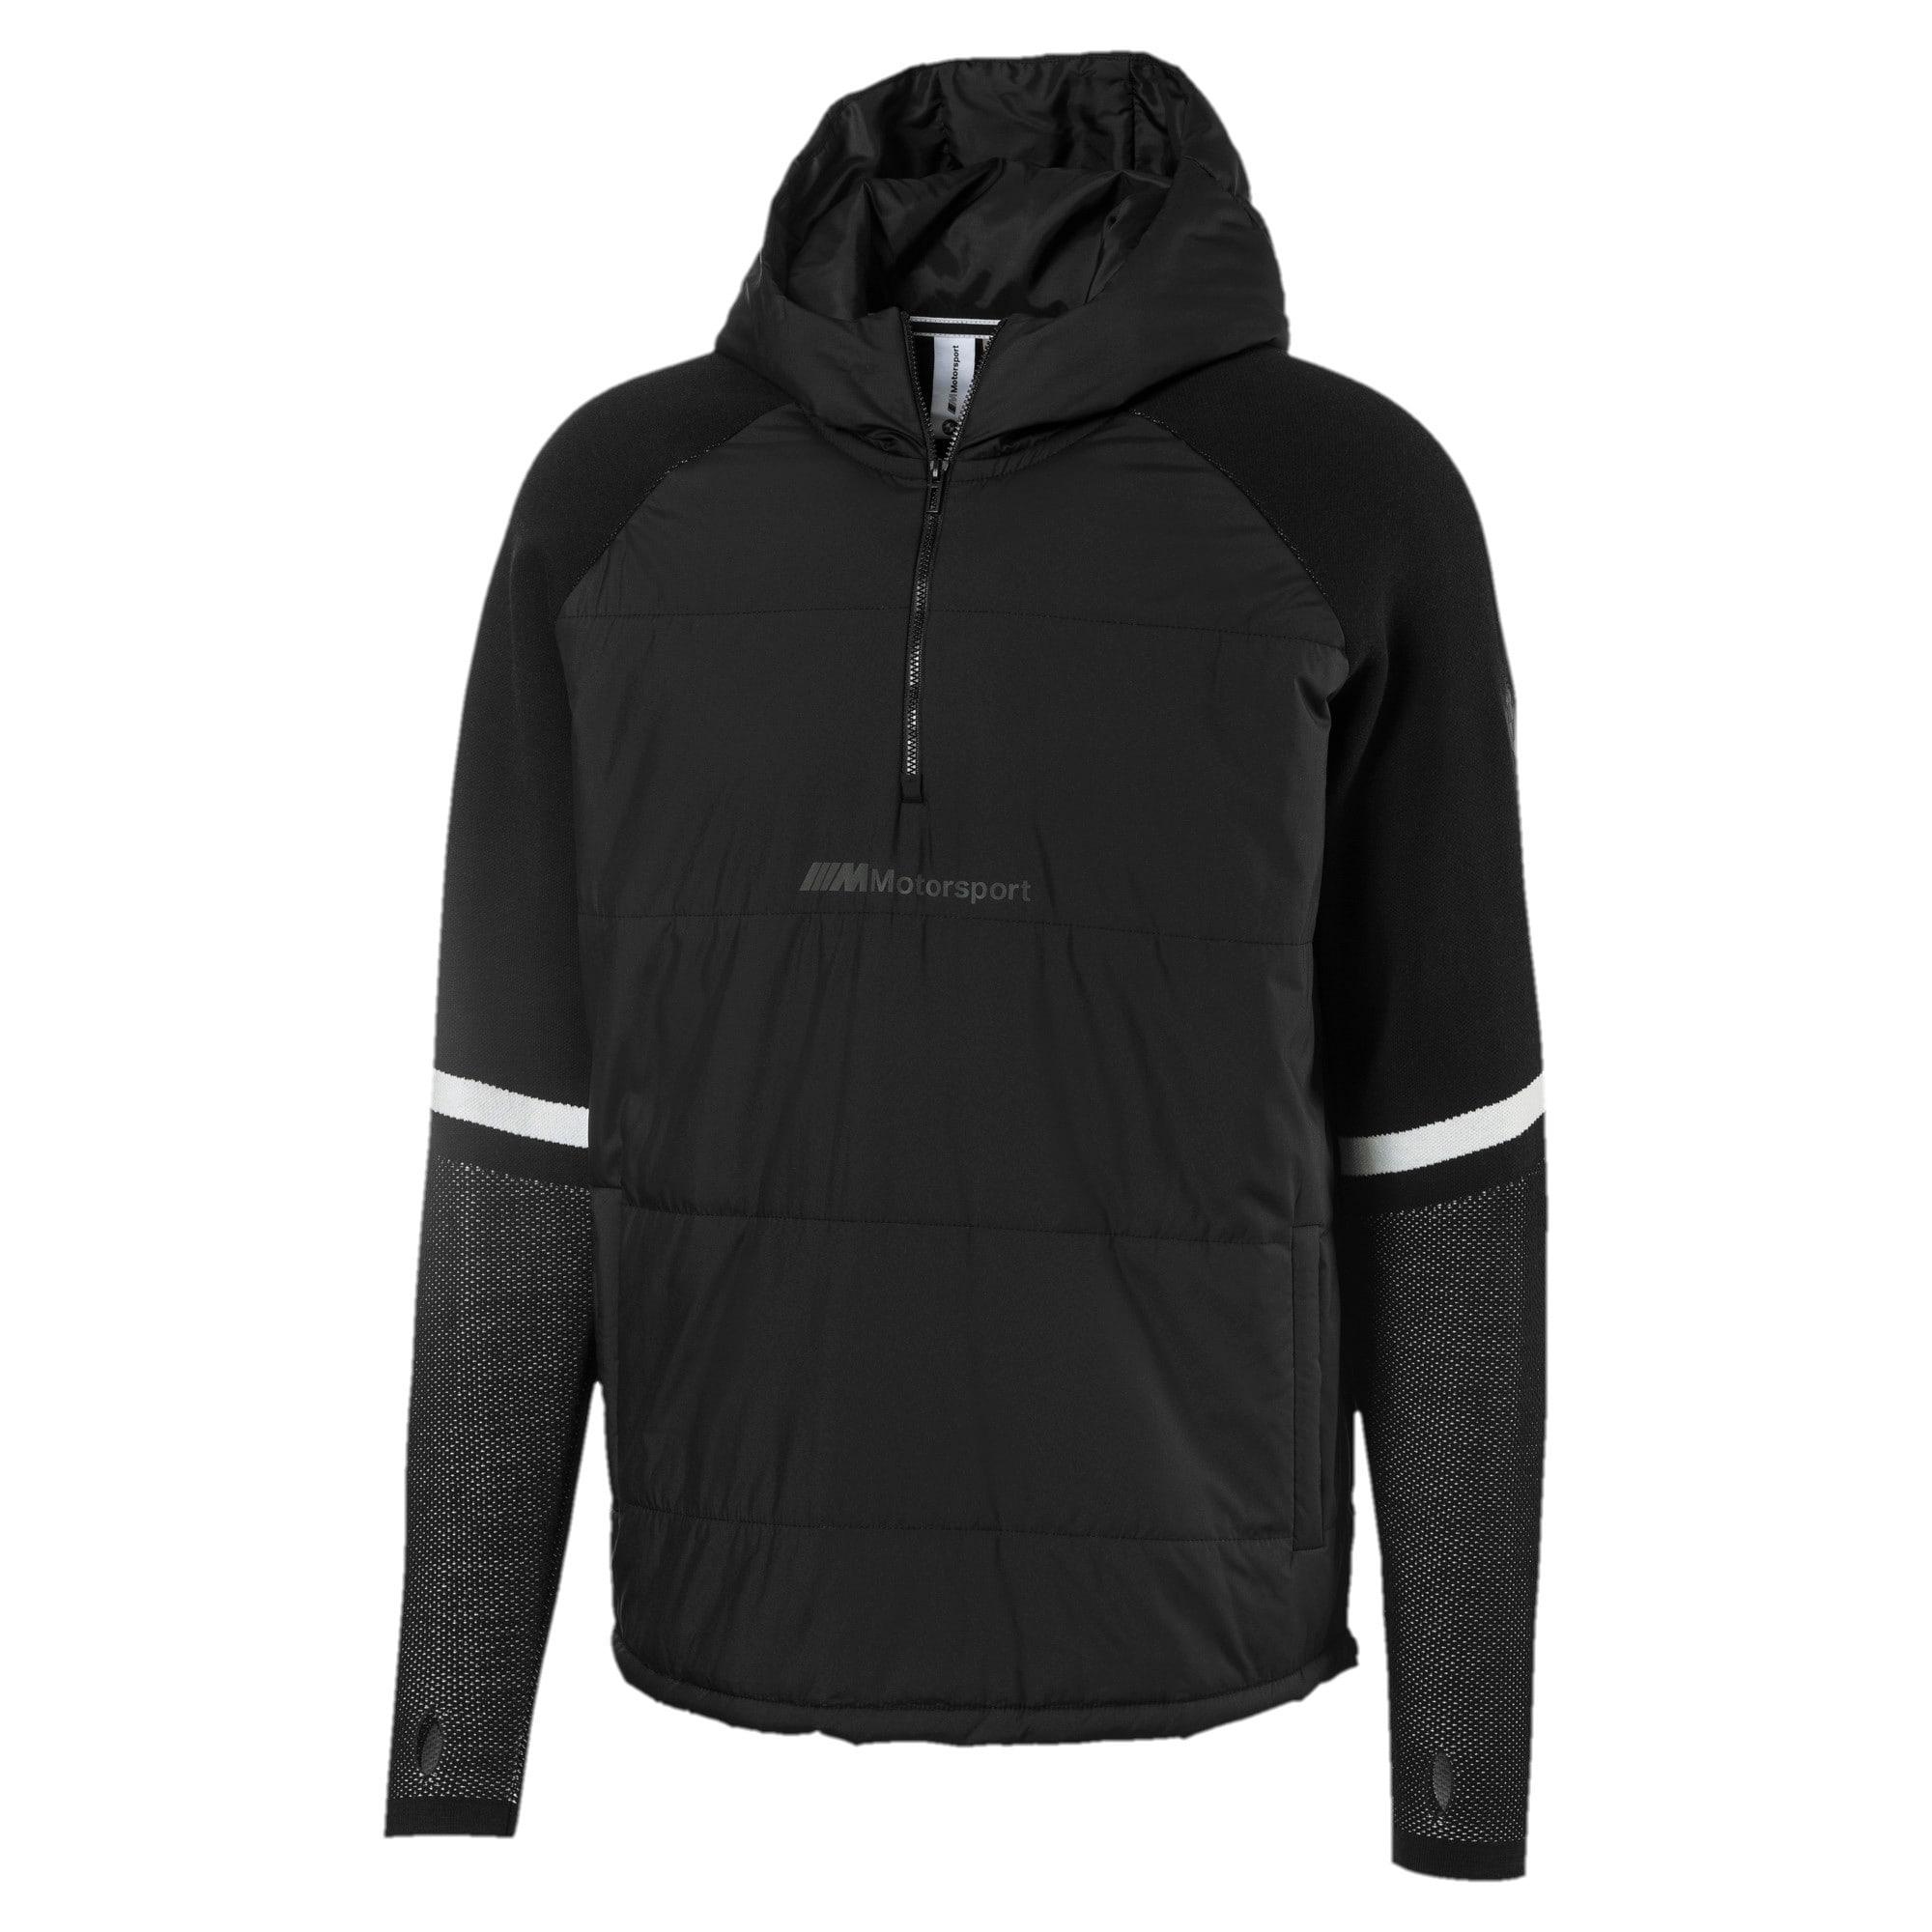 Thumbnail 1 of BMW Motorsport evoKNIT Knitted Men's Sweater, Puma Black, medium